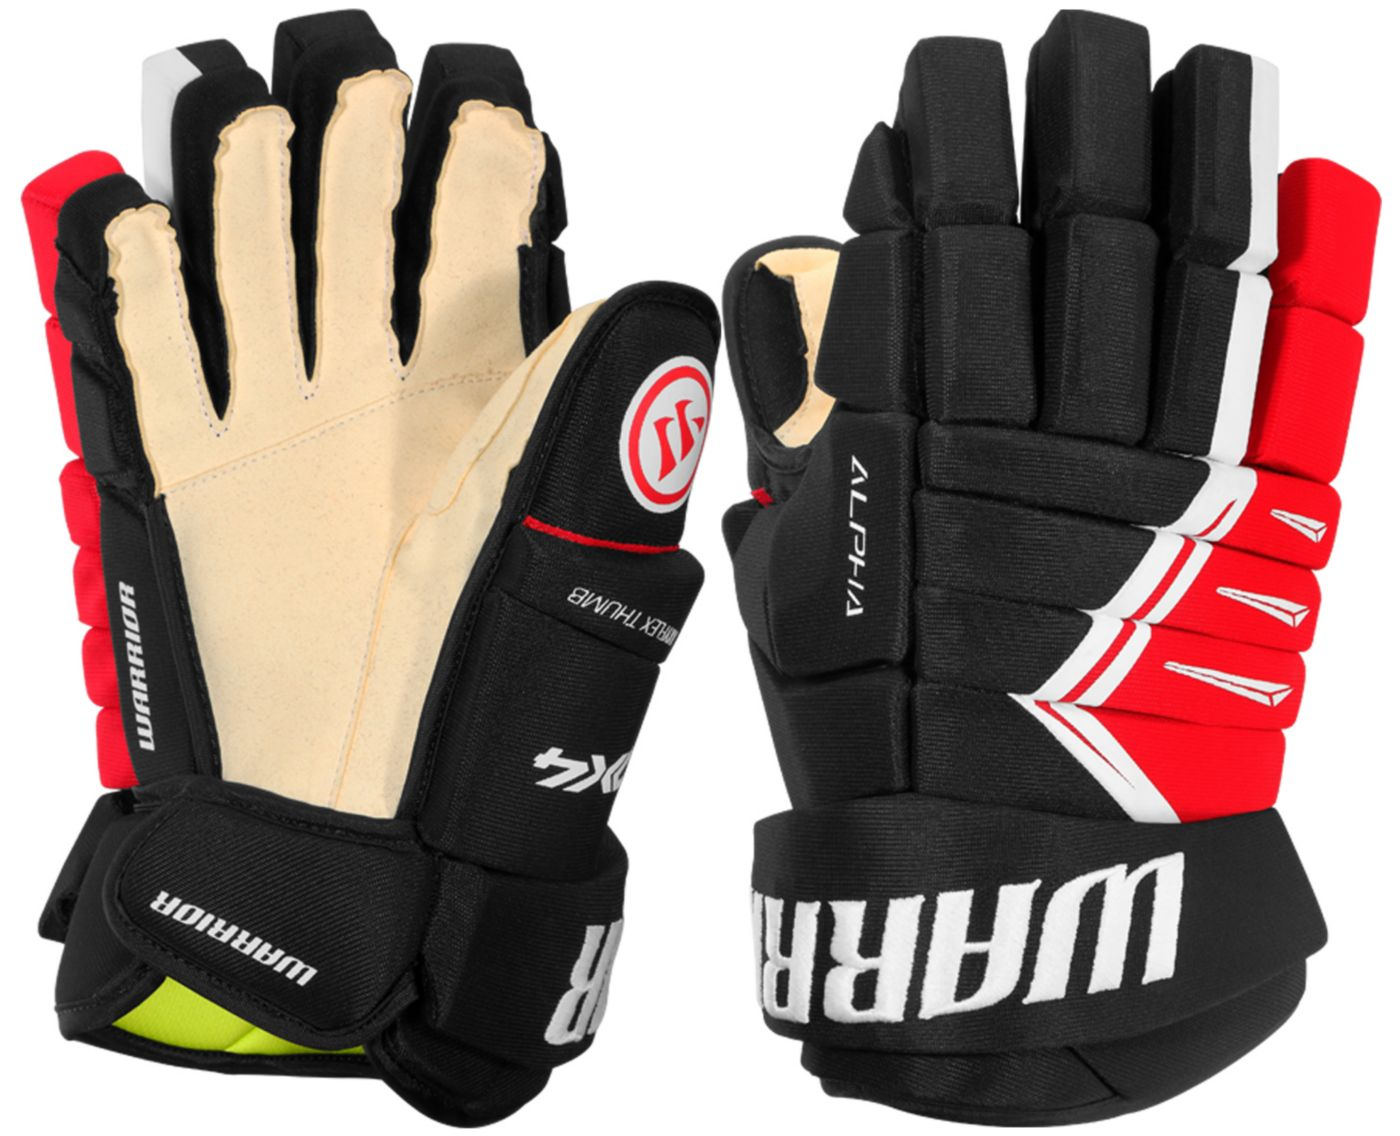 Warrior Senior Alpha DX 4 Ice Hockey Gloves